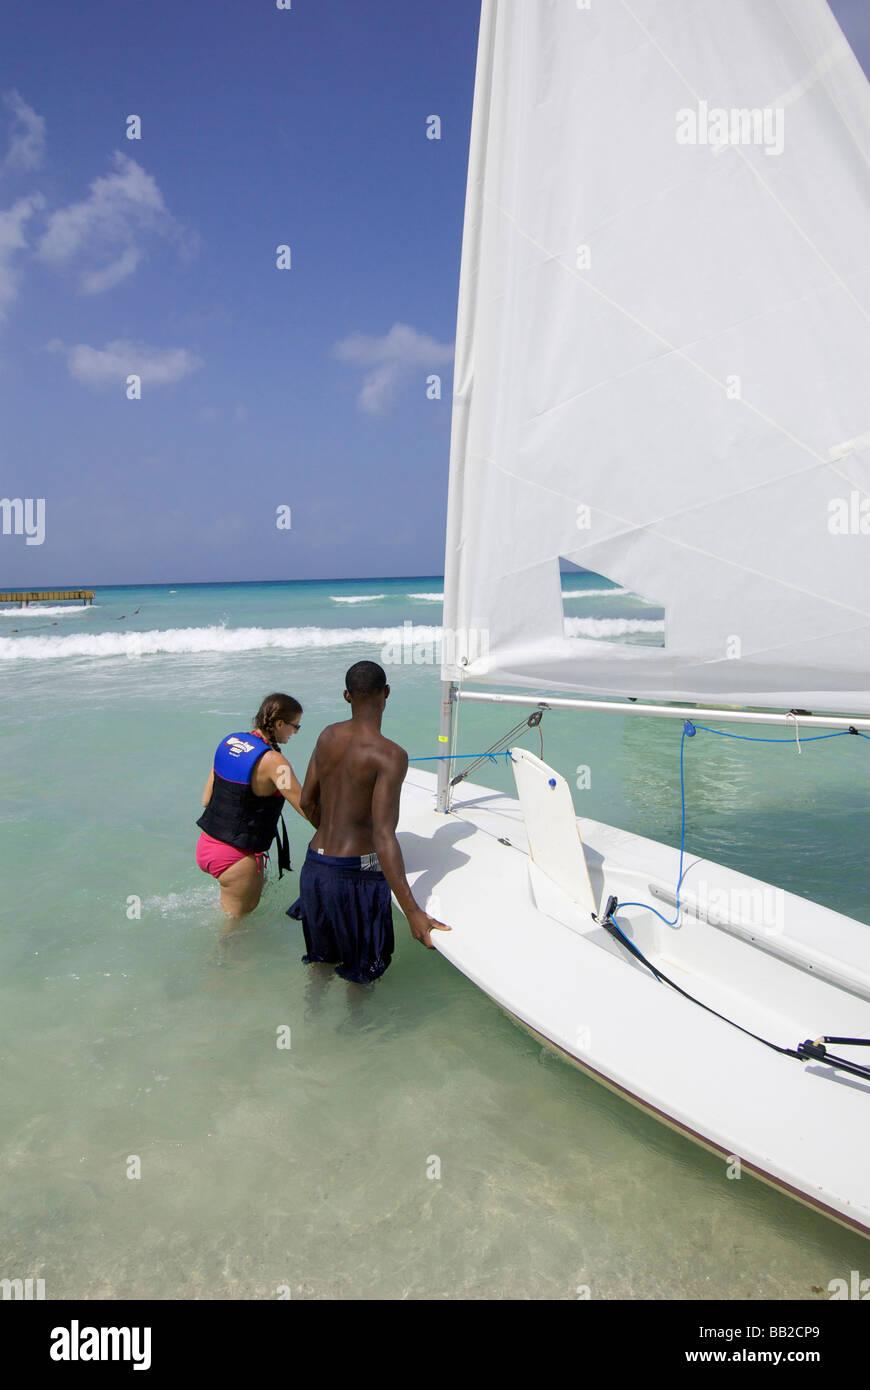 Dominican Republic, Bayahibe, Viva Wyndham Dominicus Beach. (MR) - Stock Image